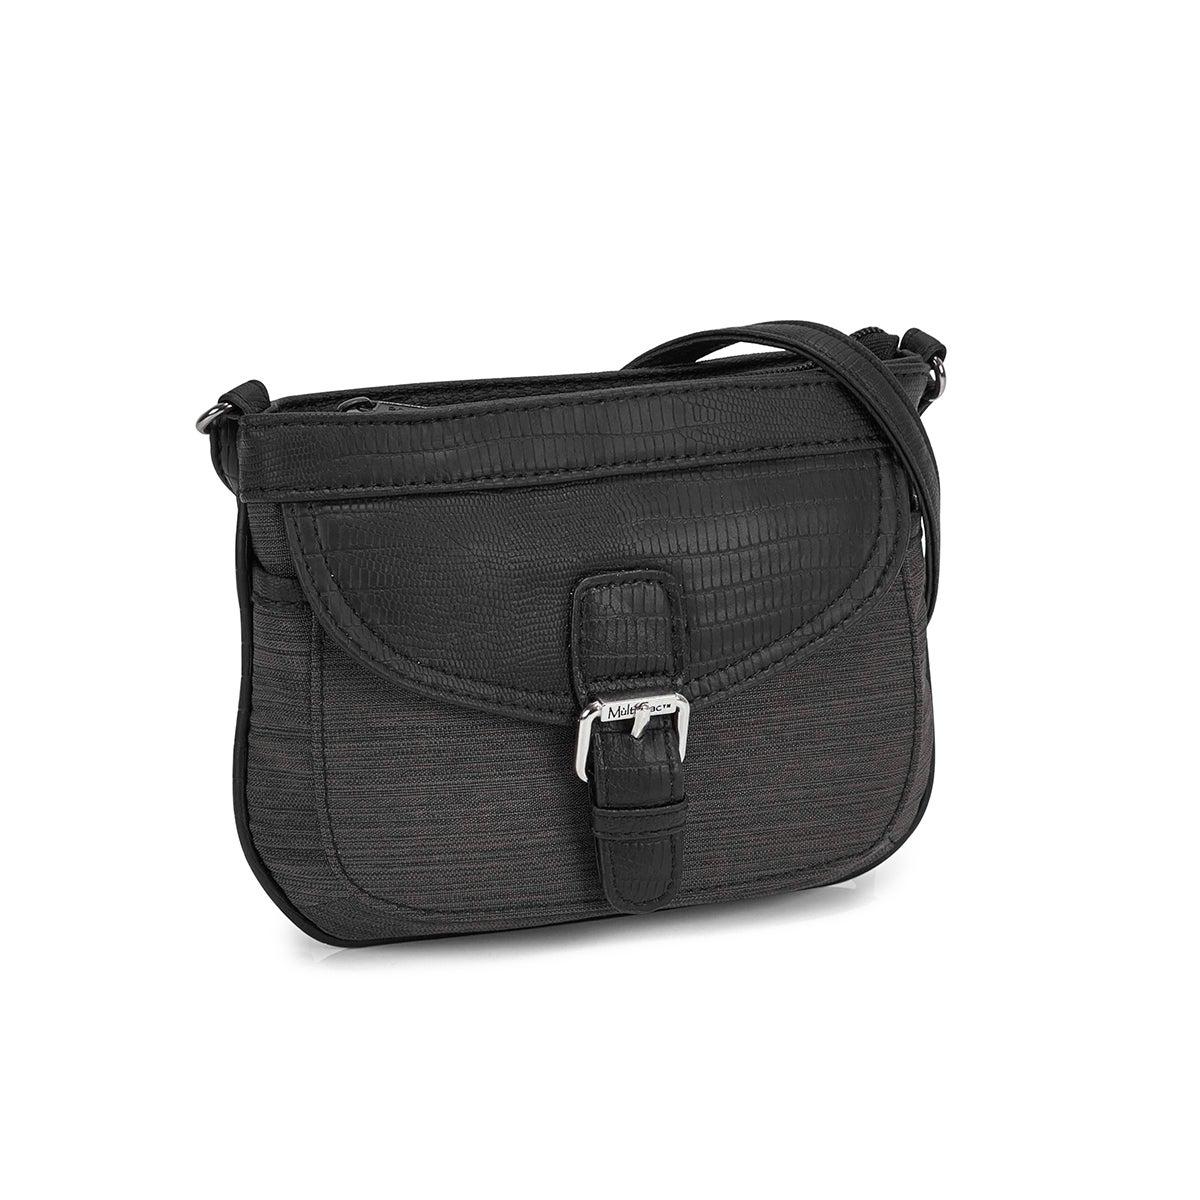 Women's black crossbody bag